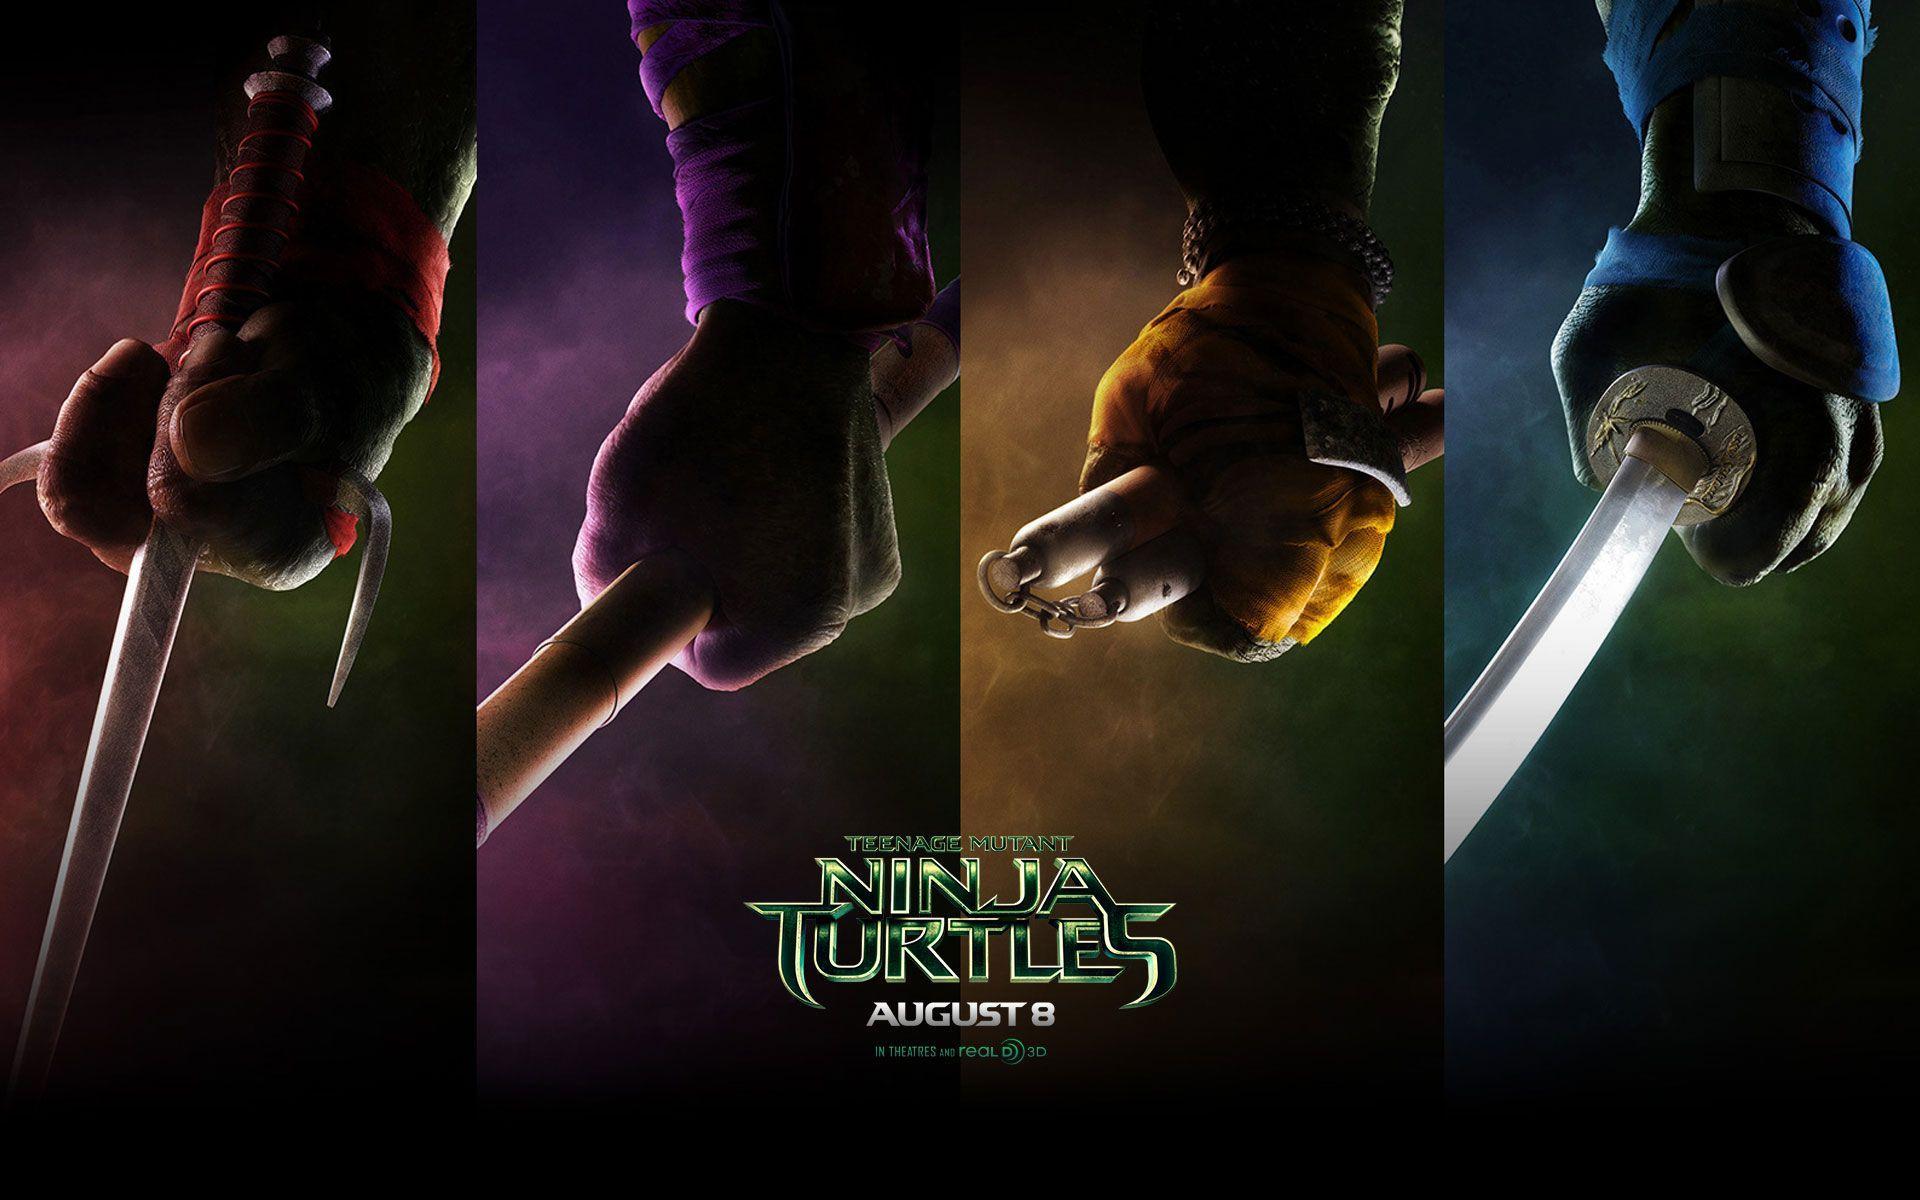 Ninja Turtle Wallpapers Top Free Ninja Turtle Backgrounds